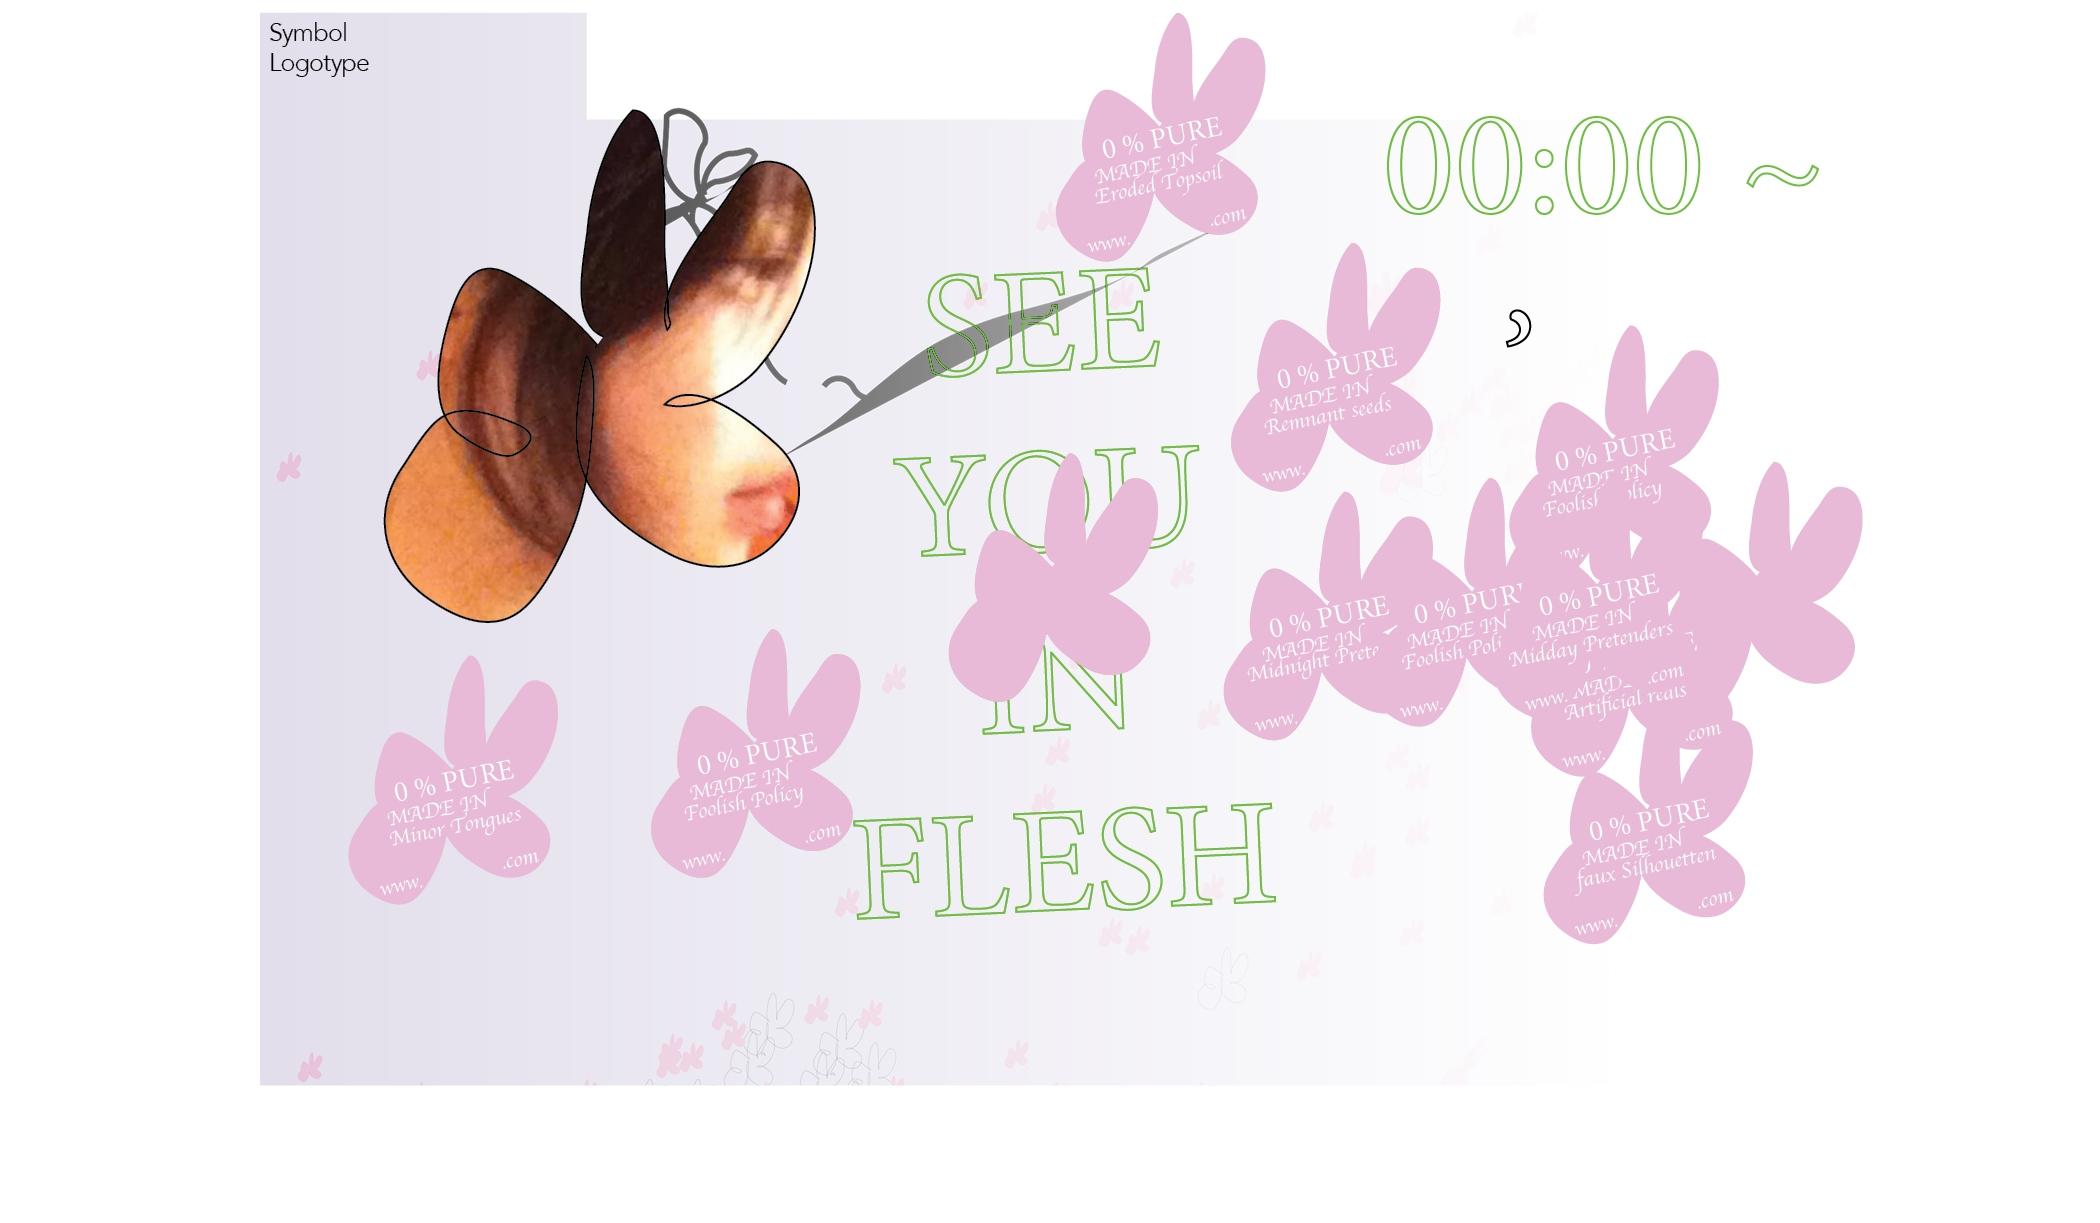 seeyouinflesh-ImageWebMailFINAL.jpg